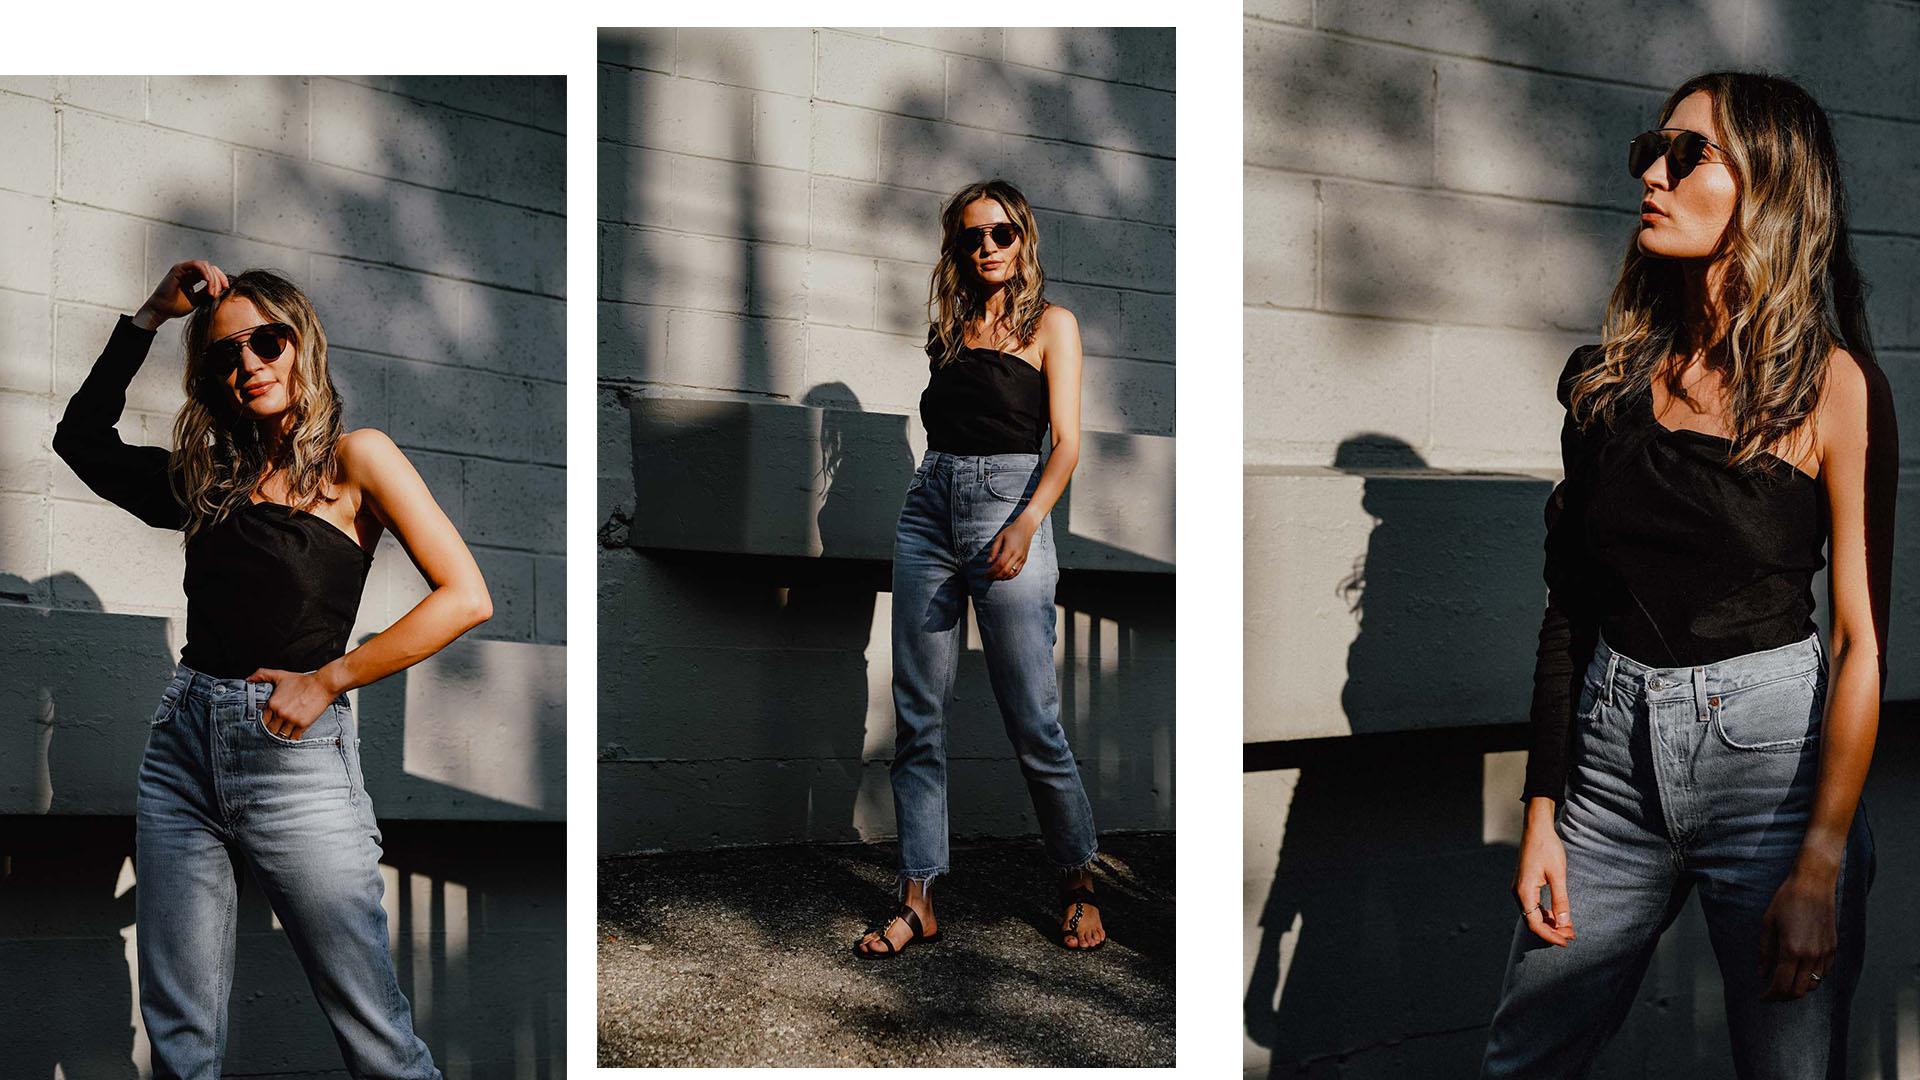 top   Zara     sunglasses   Dior Homme     jeans   AGOLDE     sandals   Gianvito Rossi